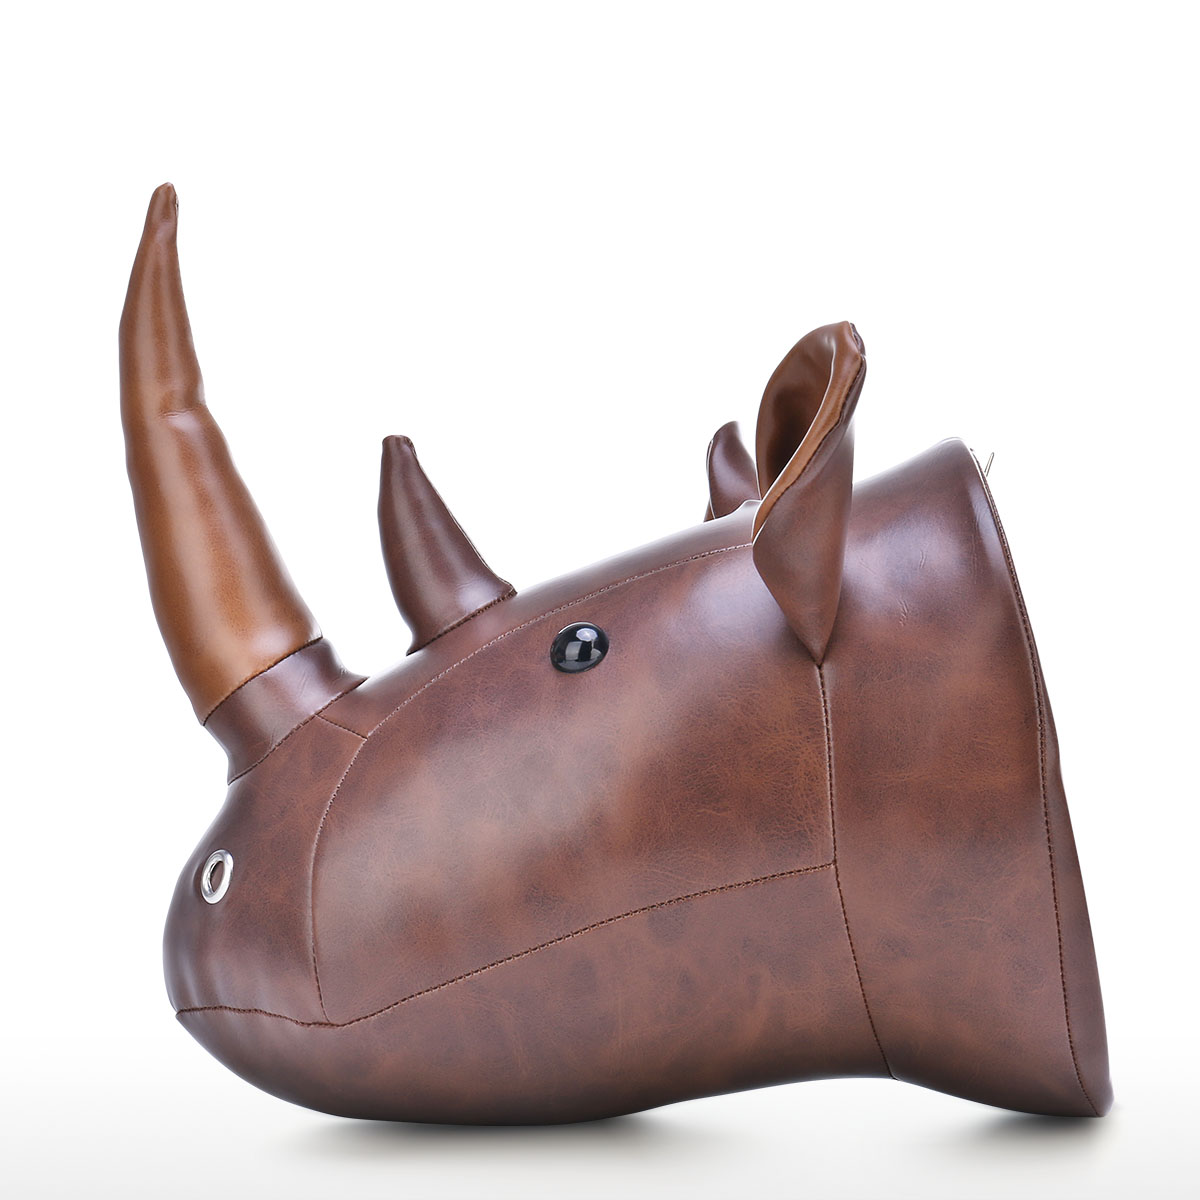 Rhino Hoofd Muur Opknoping Cartoon Dier Hoofd Muur Decor Kamer Decoratie Microfiber Leer Materiaal Kinderlijke Ornament - 3